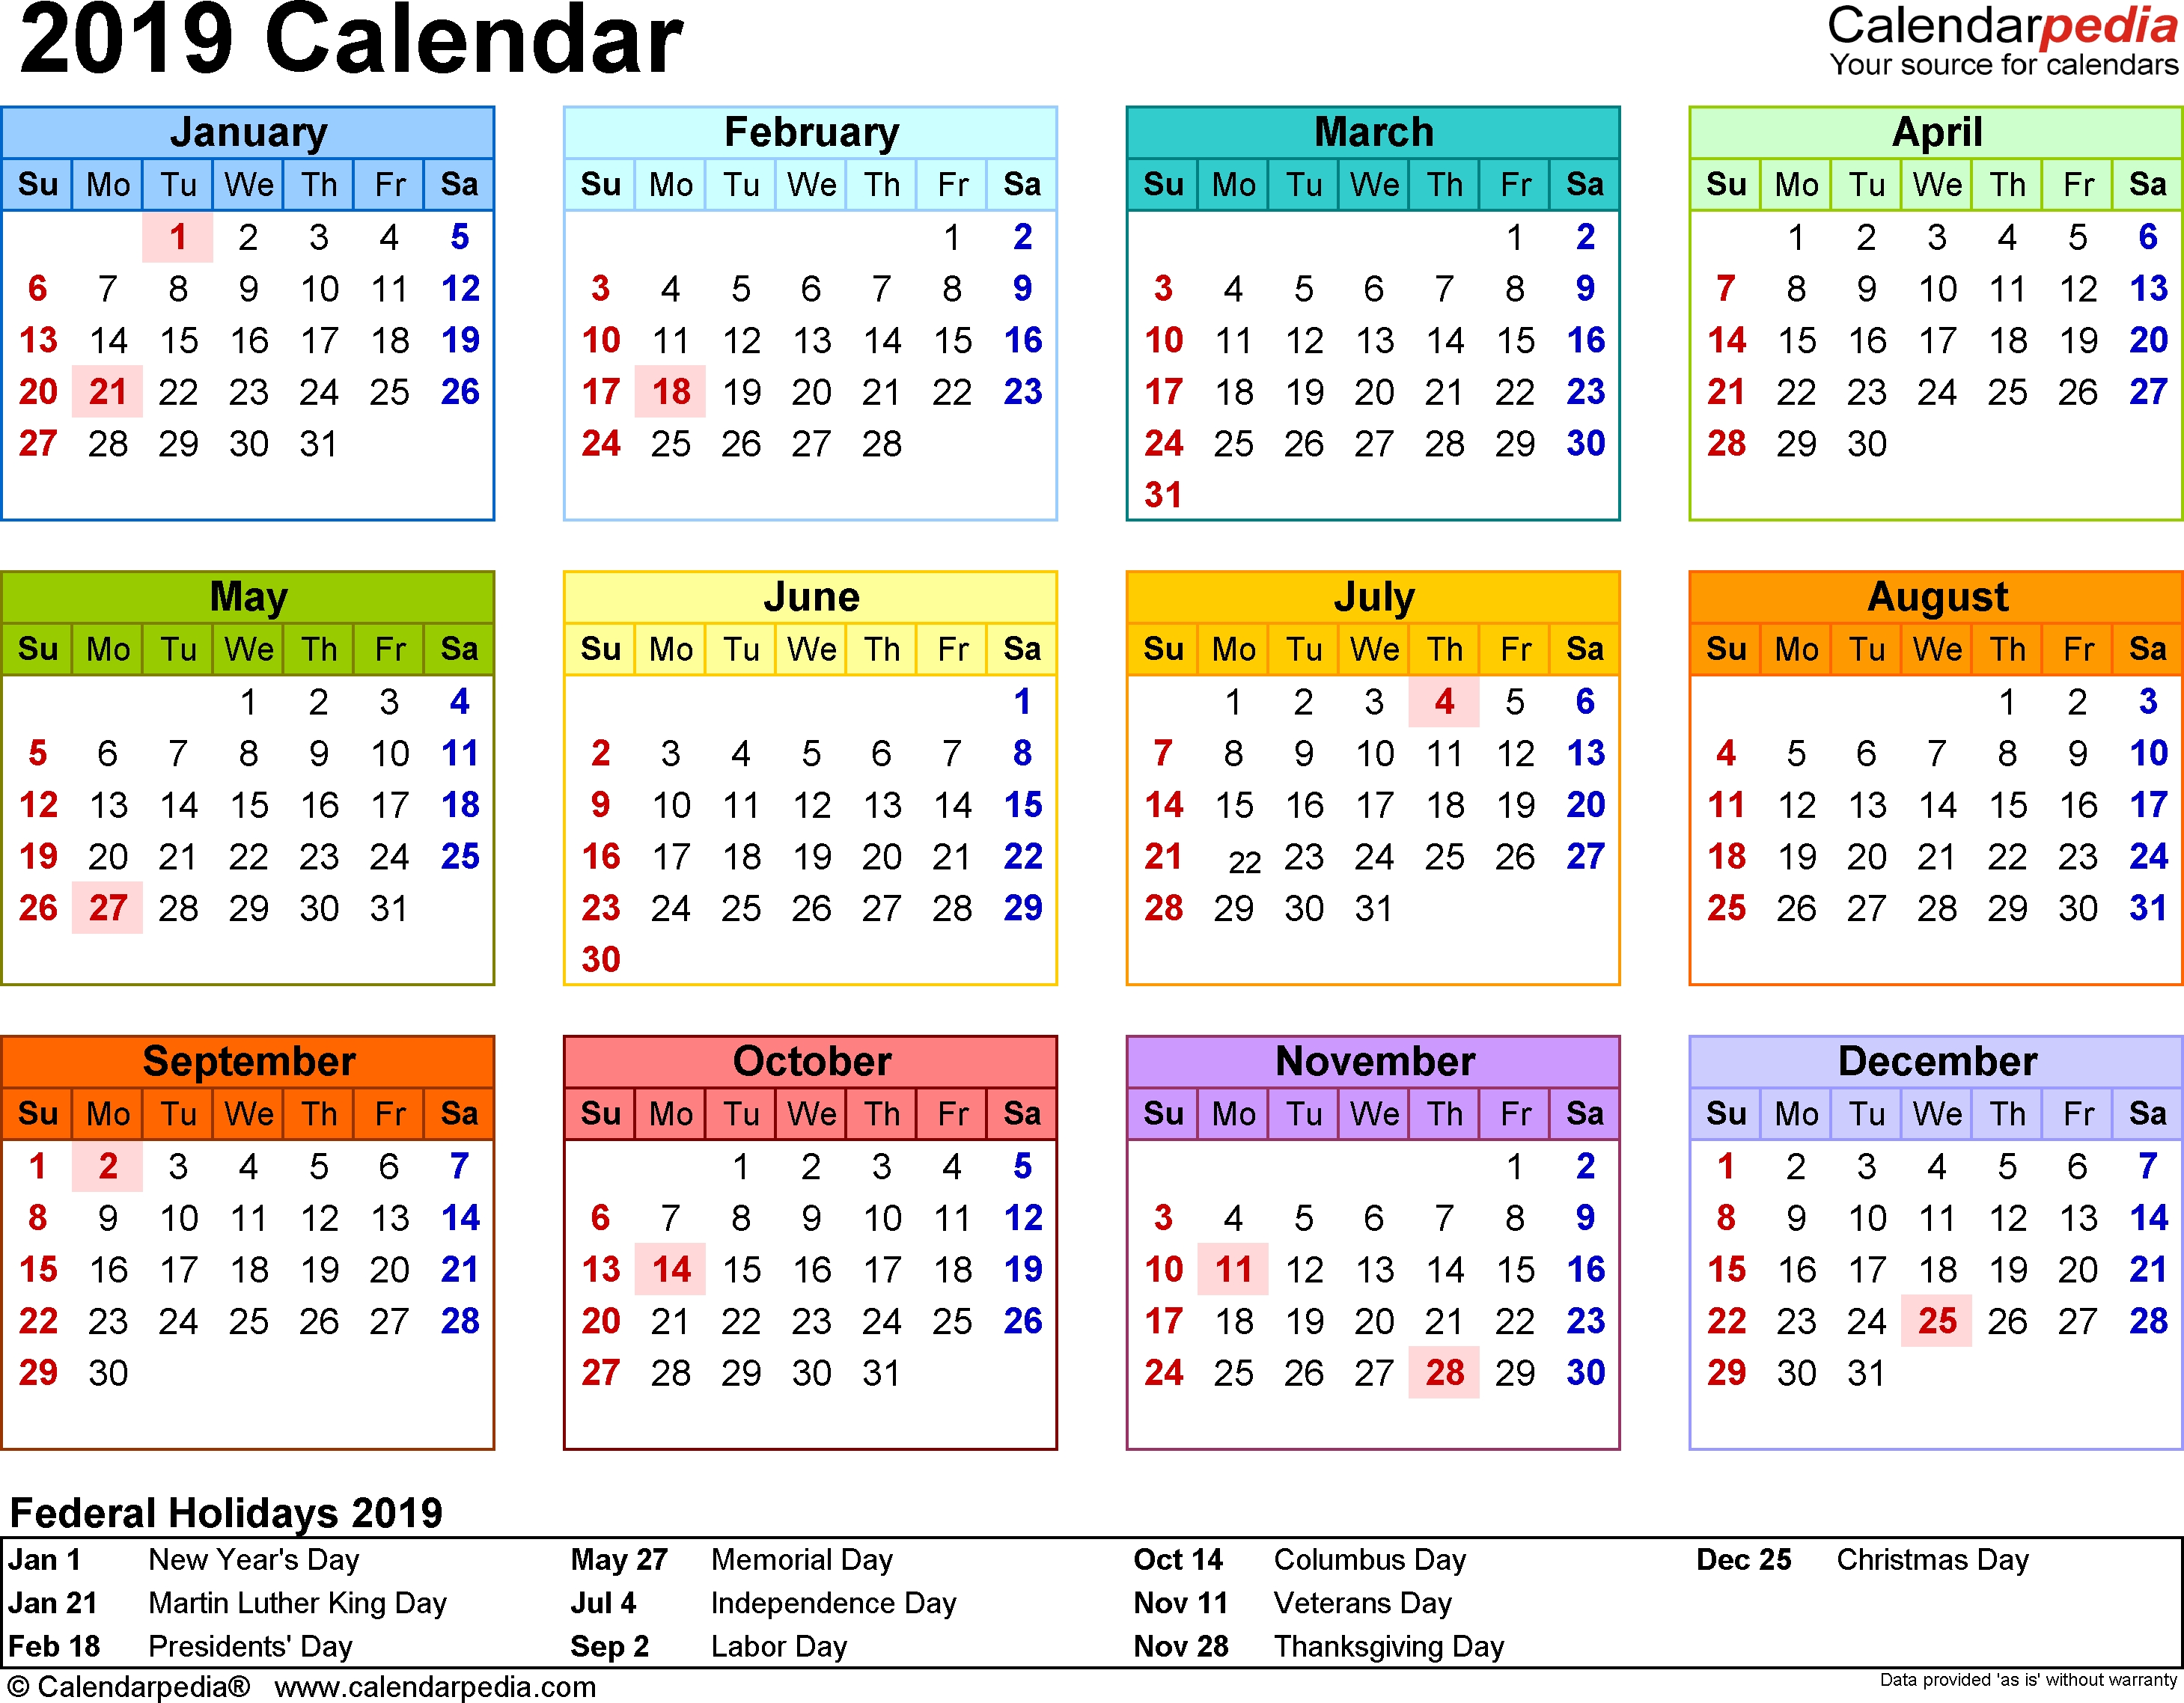 2019 Calendar Pdf - 17 Free Printable Calendar Templates regarding Year At A Glance Template